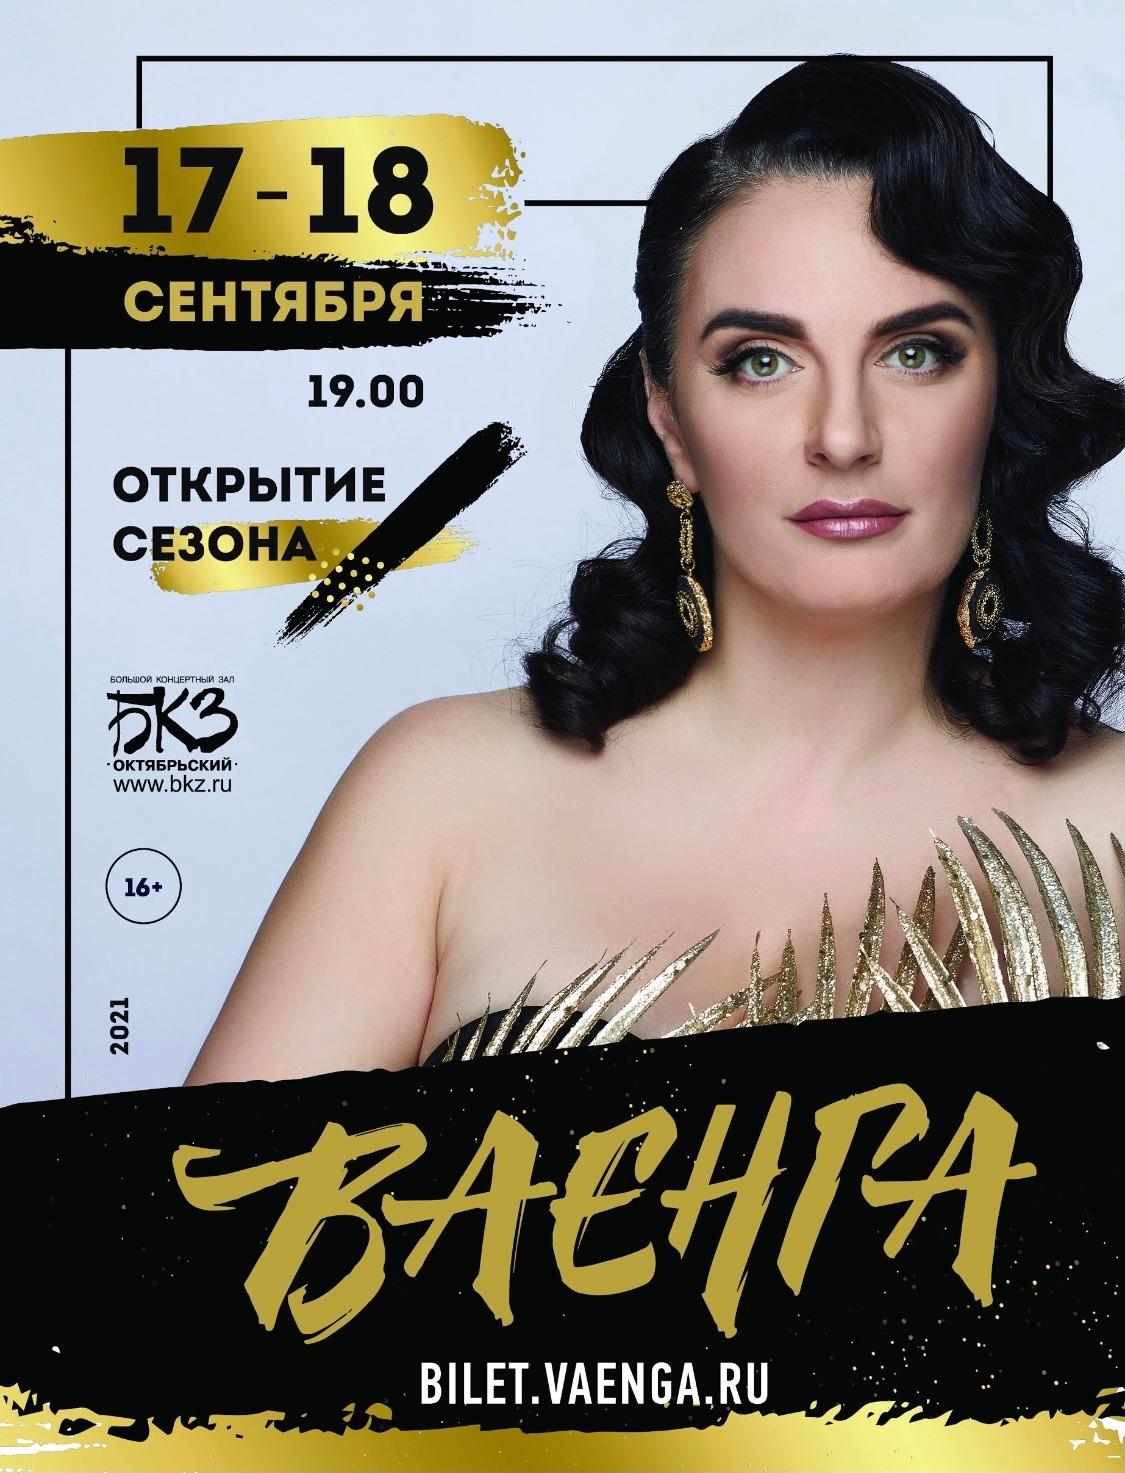 Елена Ваенга концерт БКЗ Октябрьский